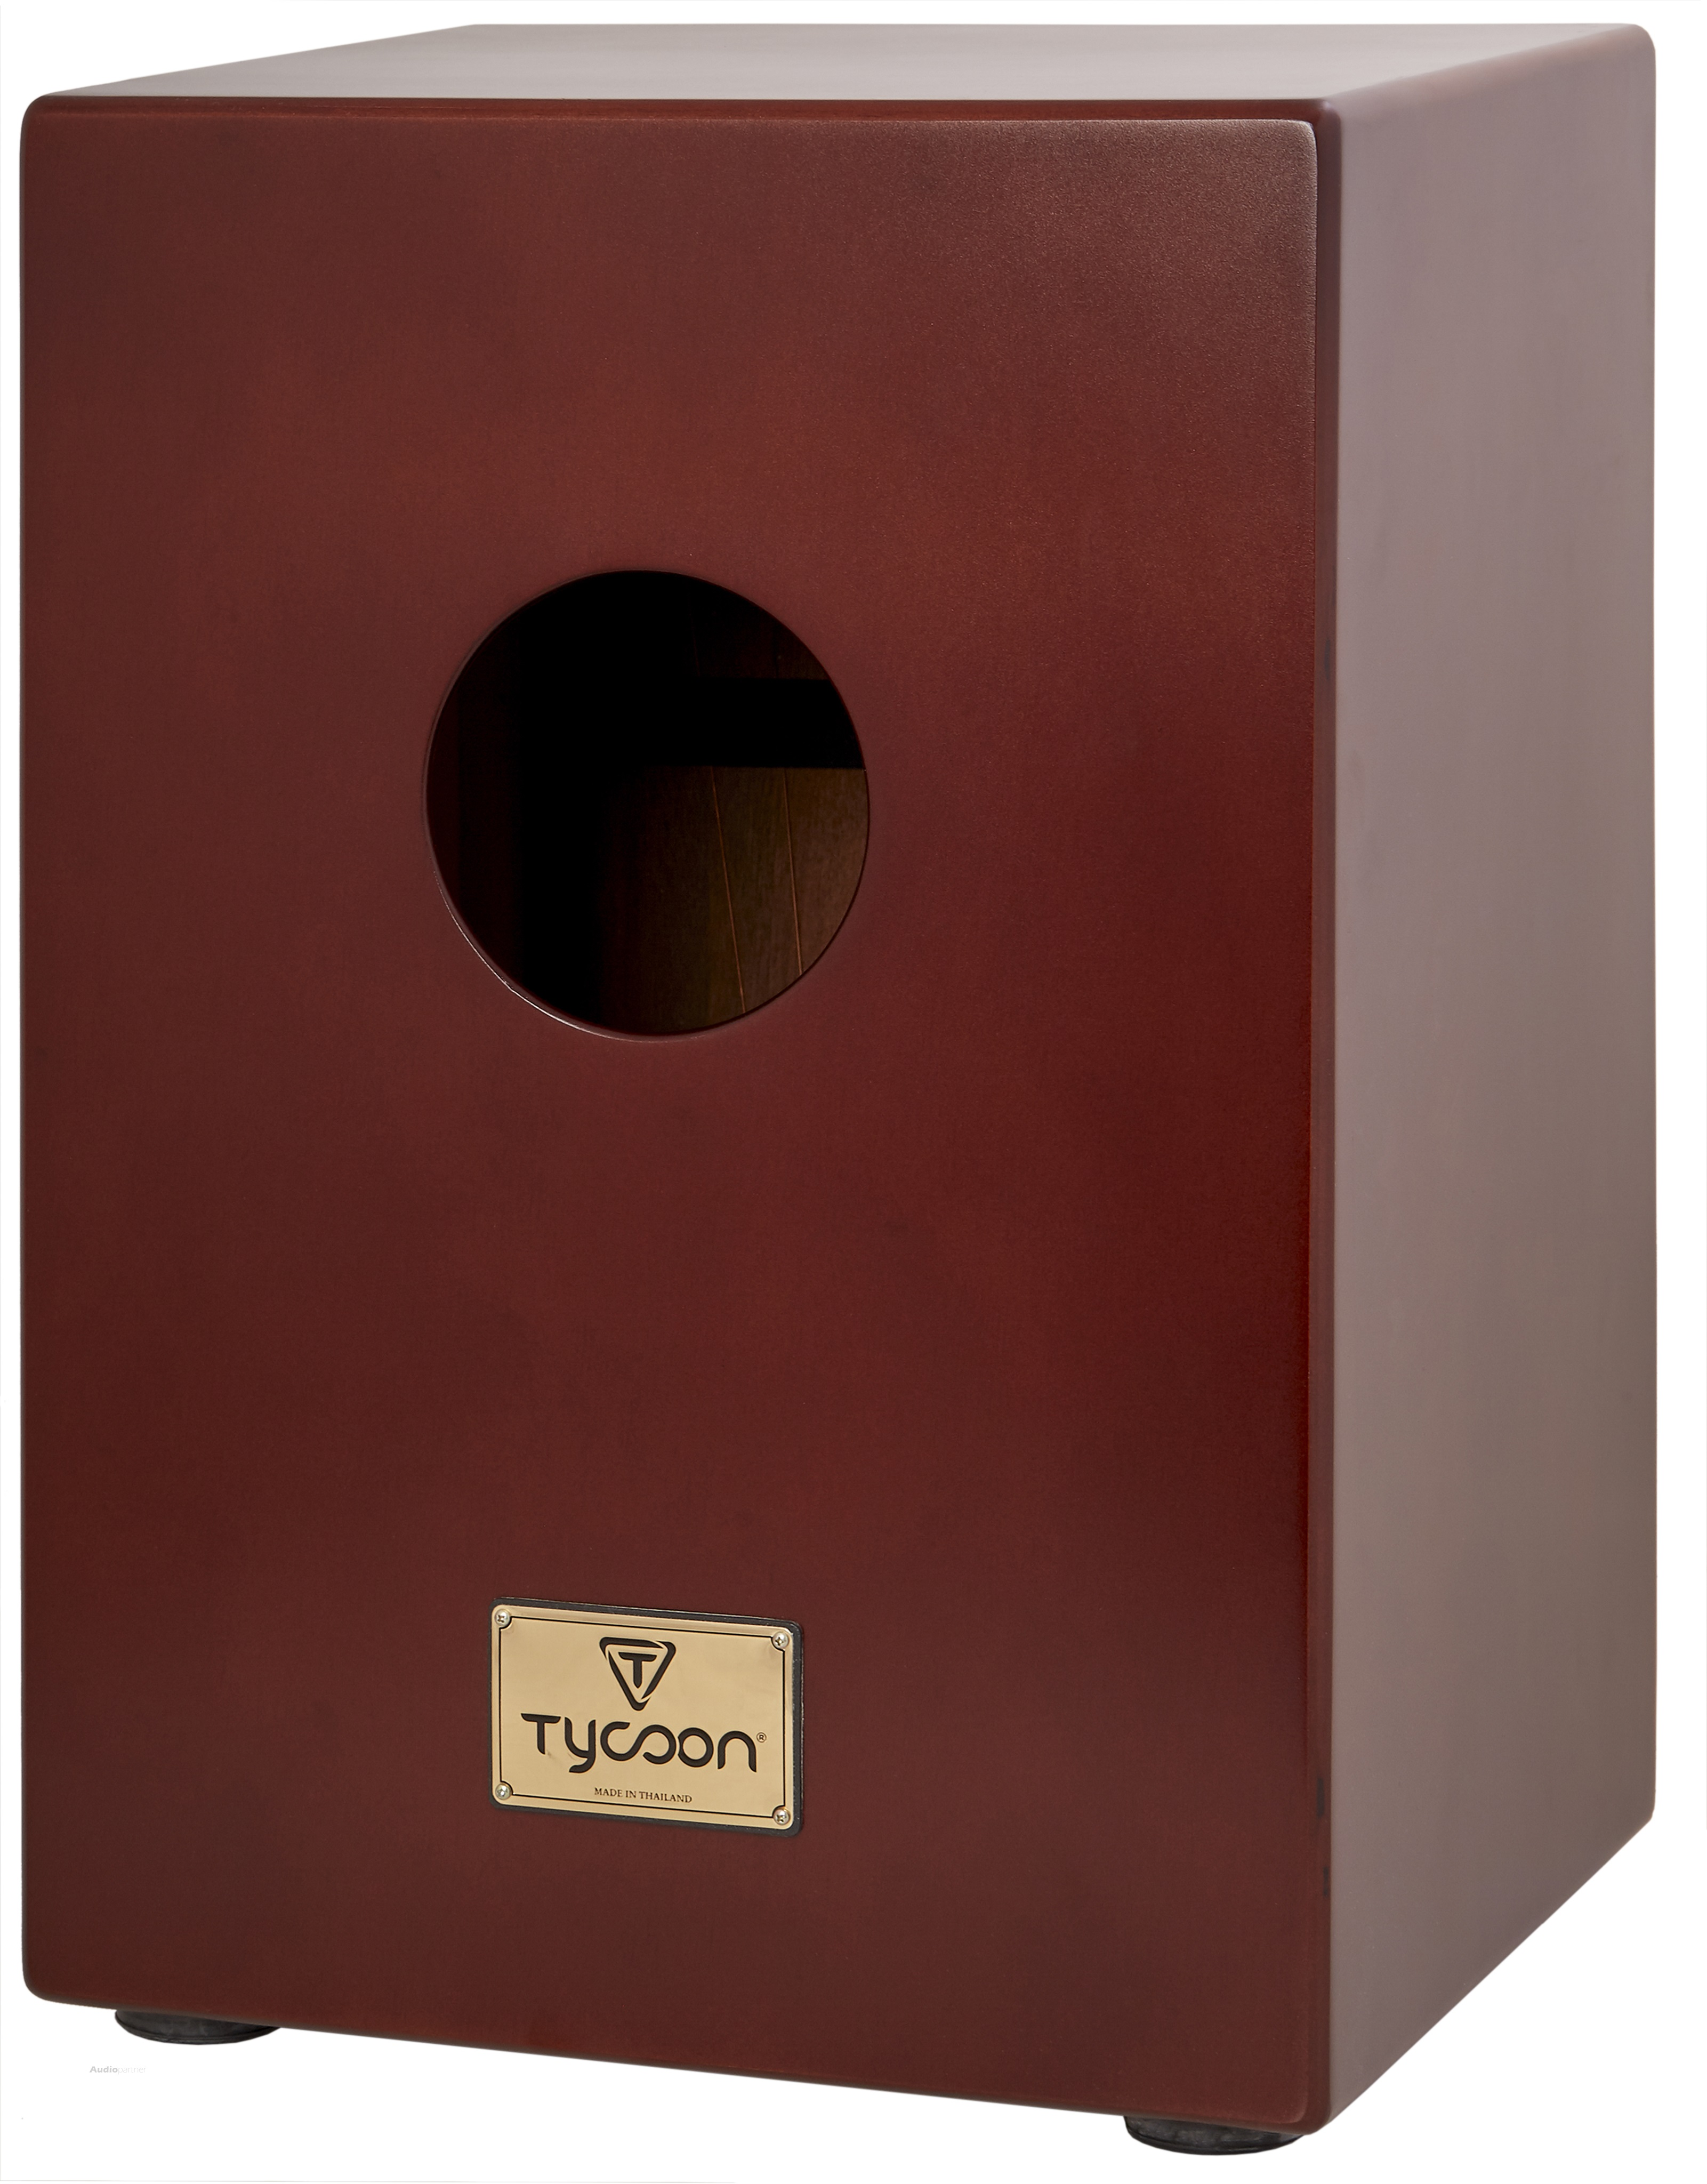 TYCOON TK-35 Cajon